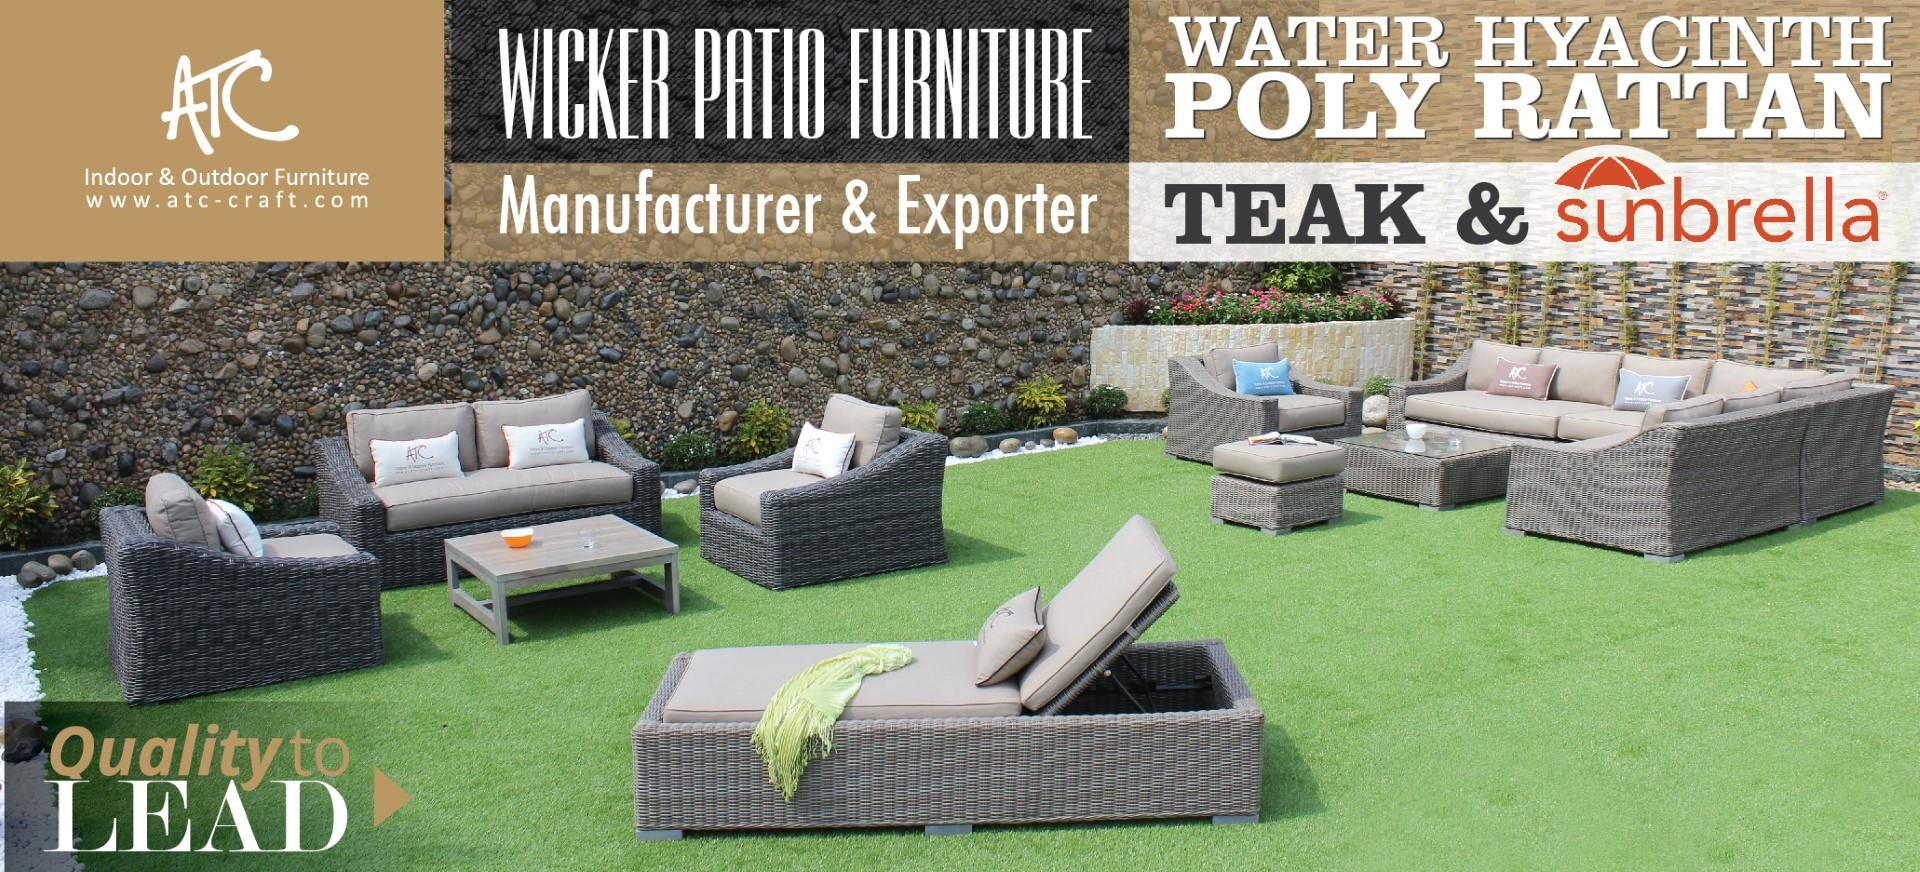 Pvc Garden Furniture Atc furniture furnishings corp patio garden furniturepvc rattan multi language sites workwithnaturefo